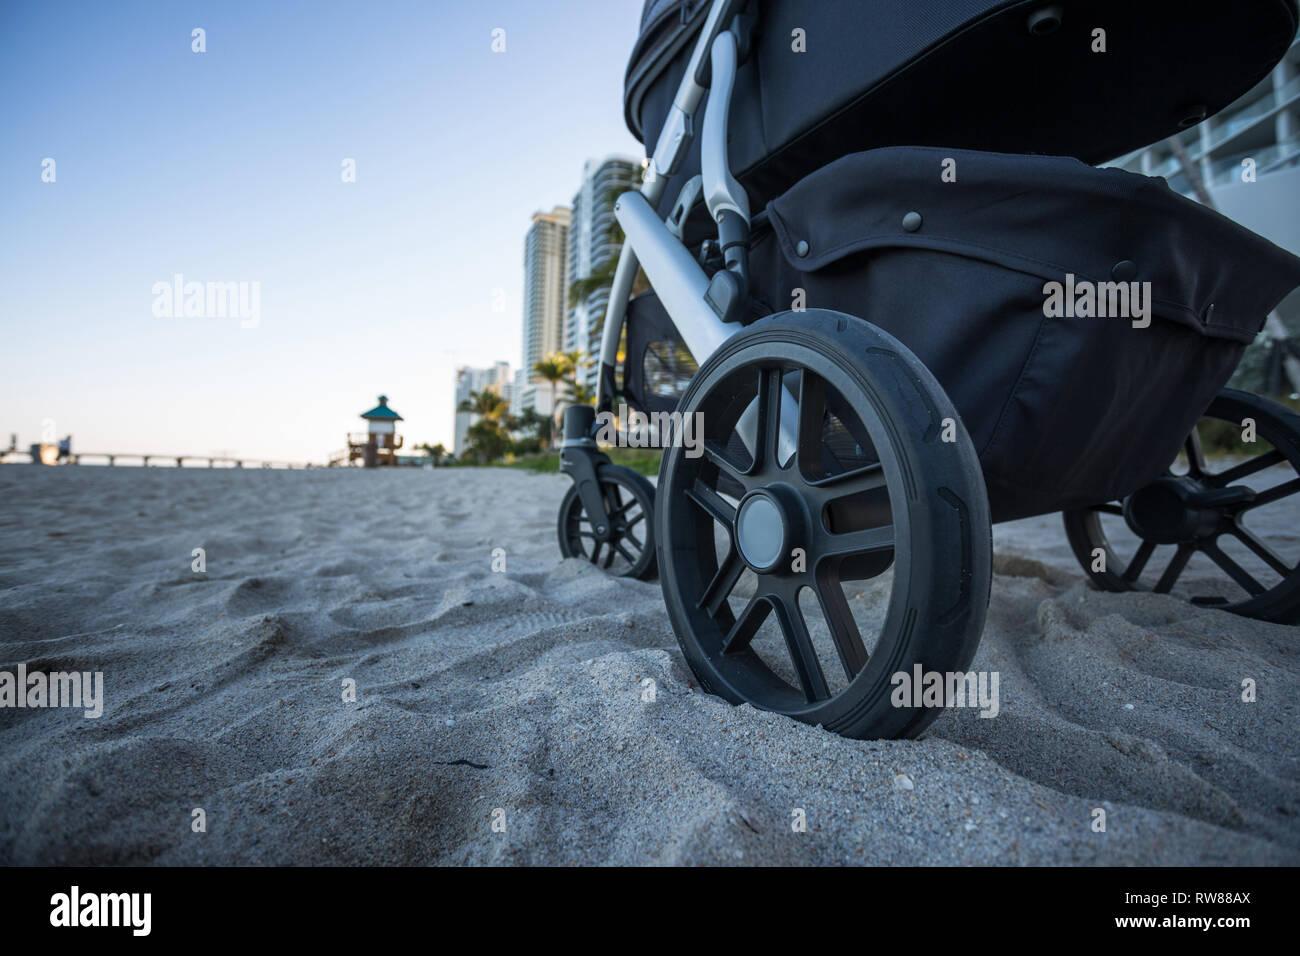 Baby on the beach. Колясска на пляже в Маями - Stock Image